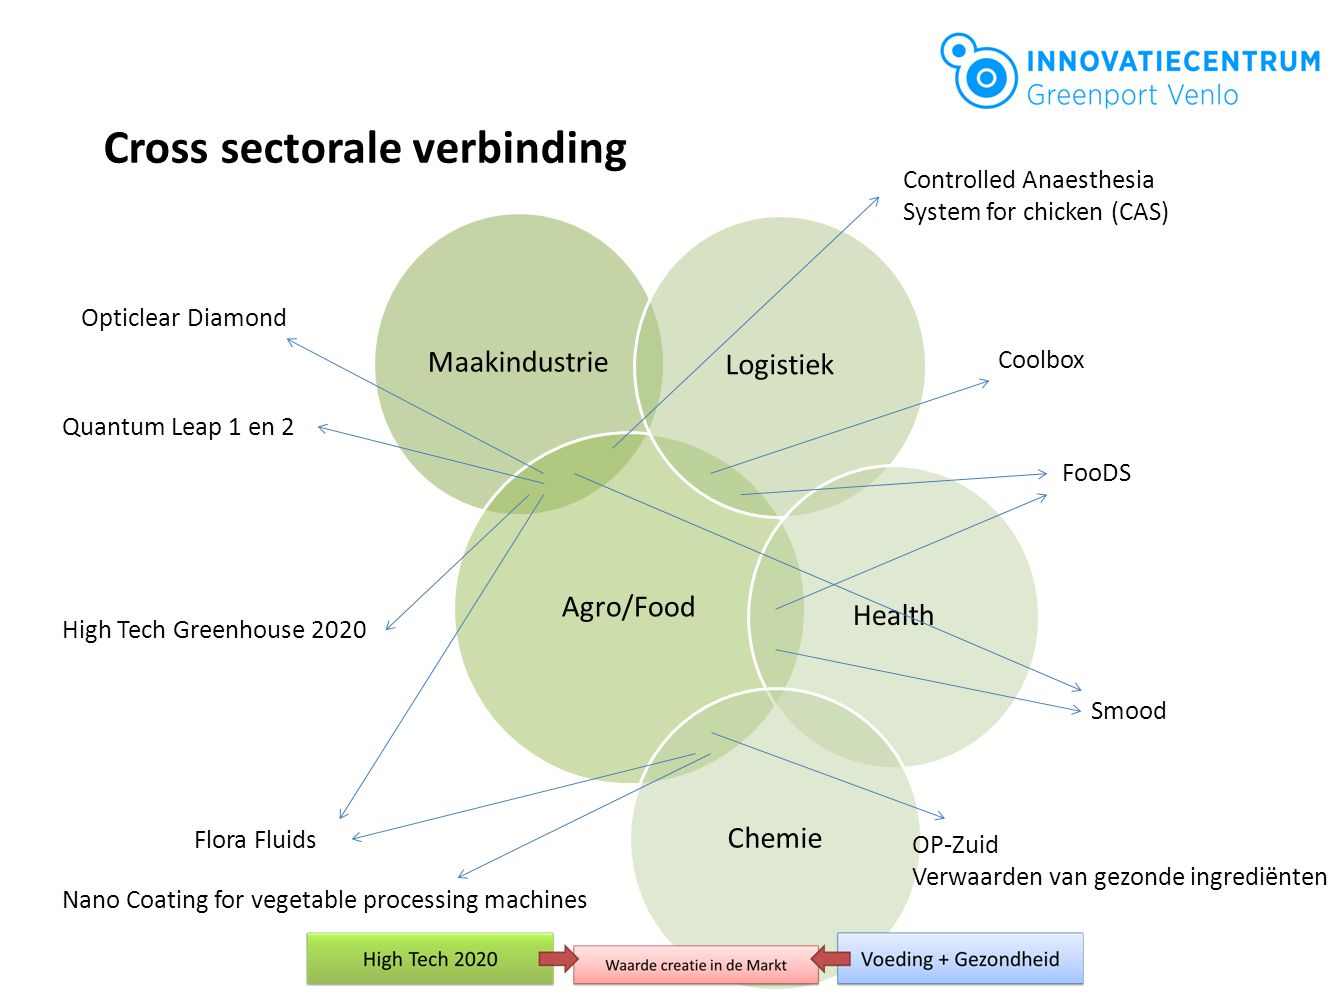 www.innovatiecentrumvenlo.nl